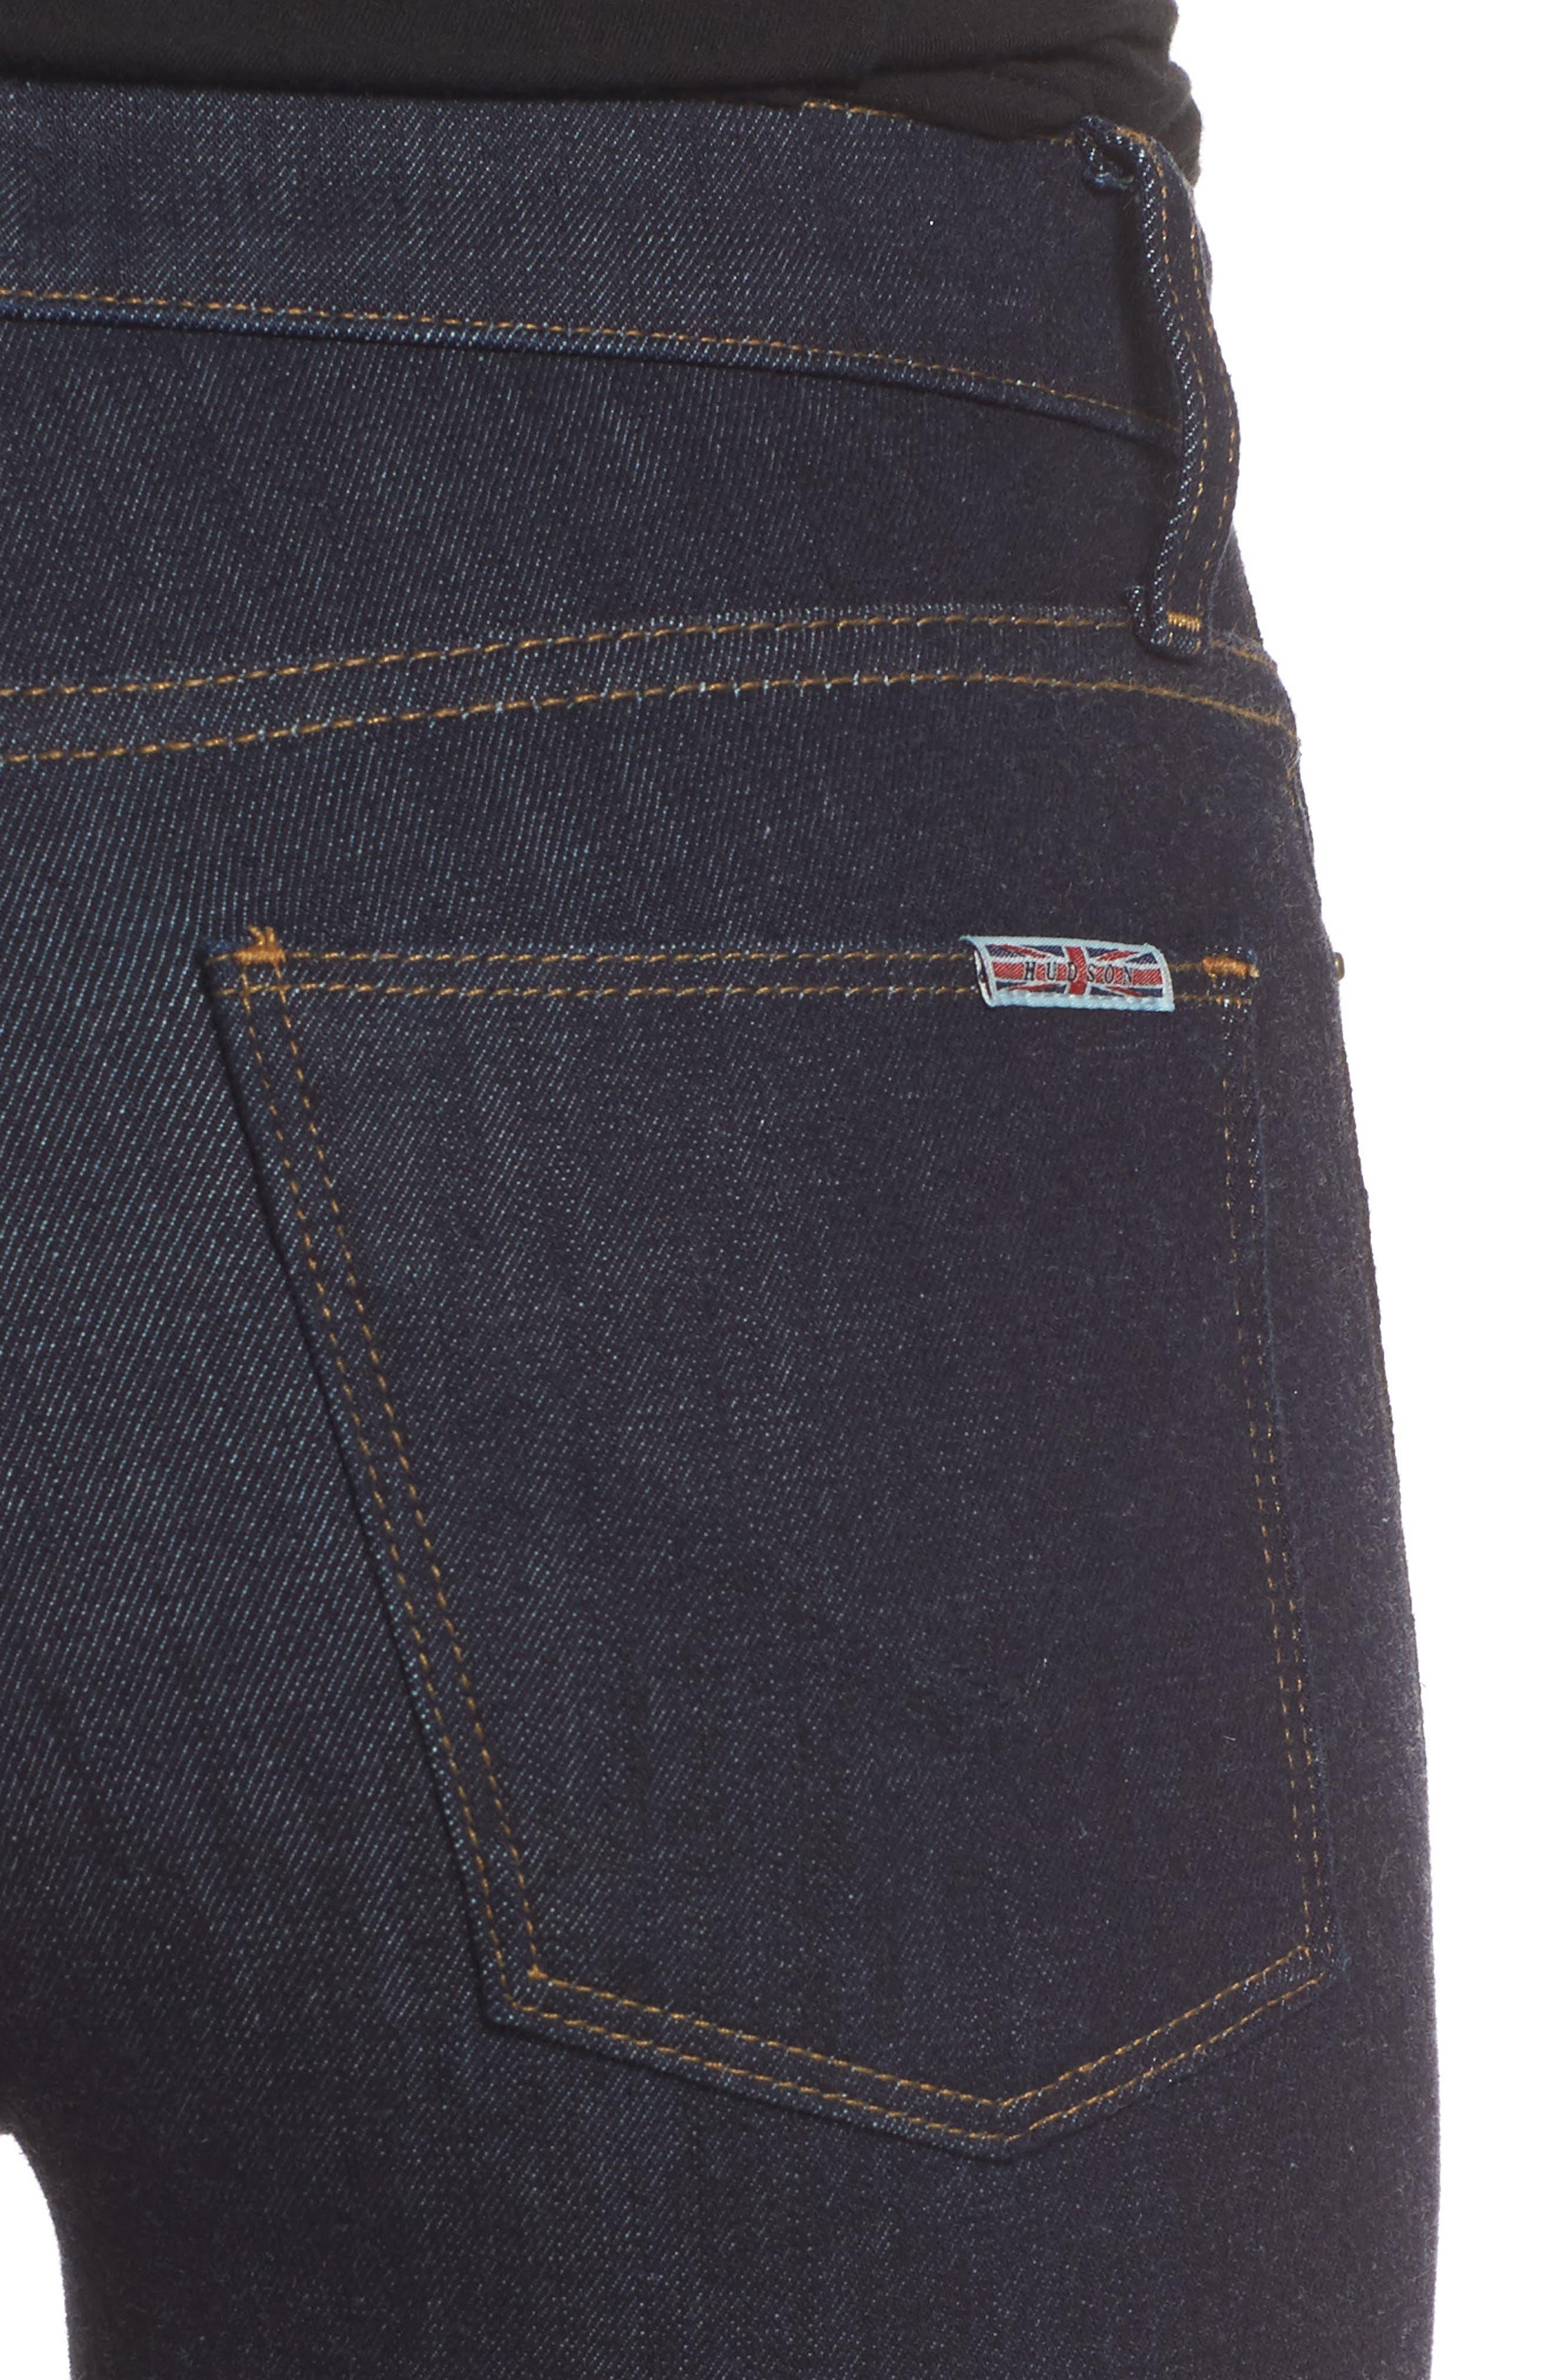 Nico Super Skinny Jeans,                             Alternate thumbnail 11, color,